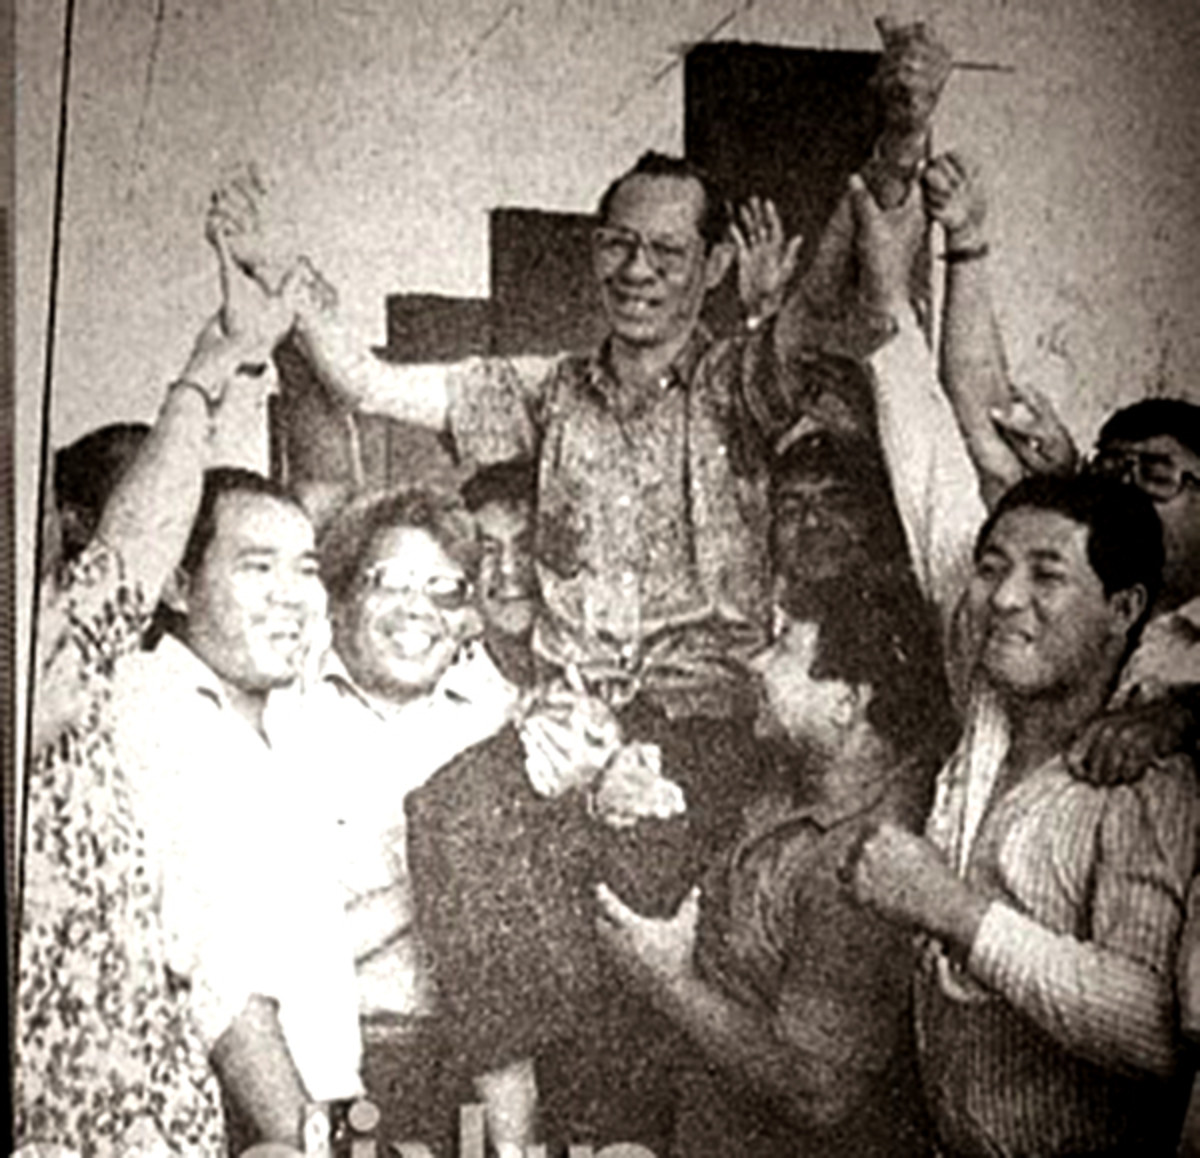 pak-man-telo-the-originator-of-the-ponzi-scheme-in-malaysia